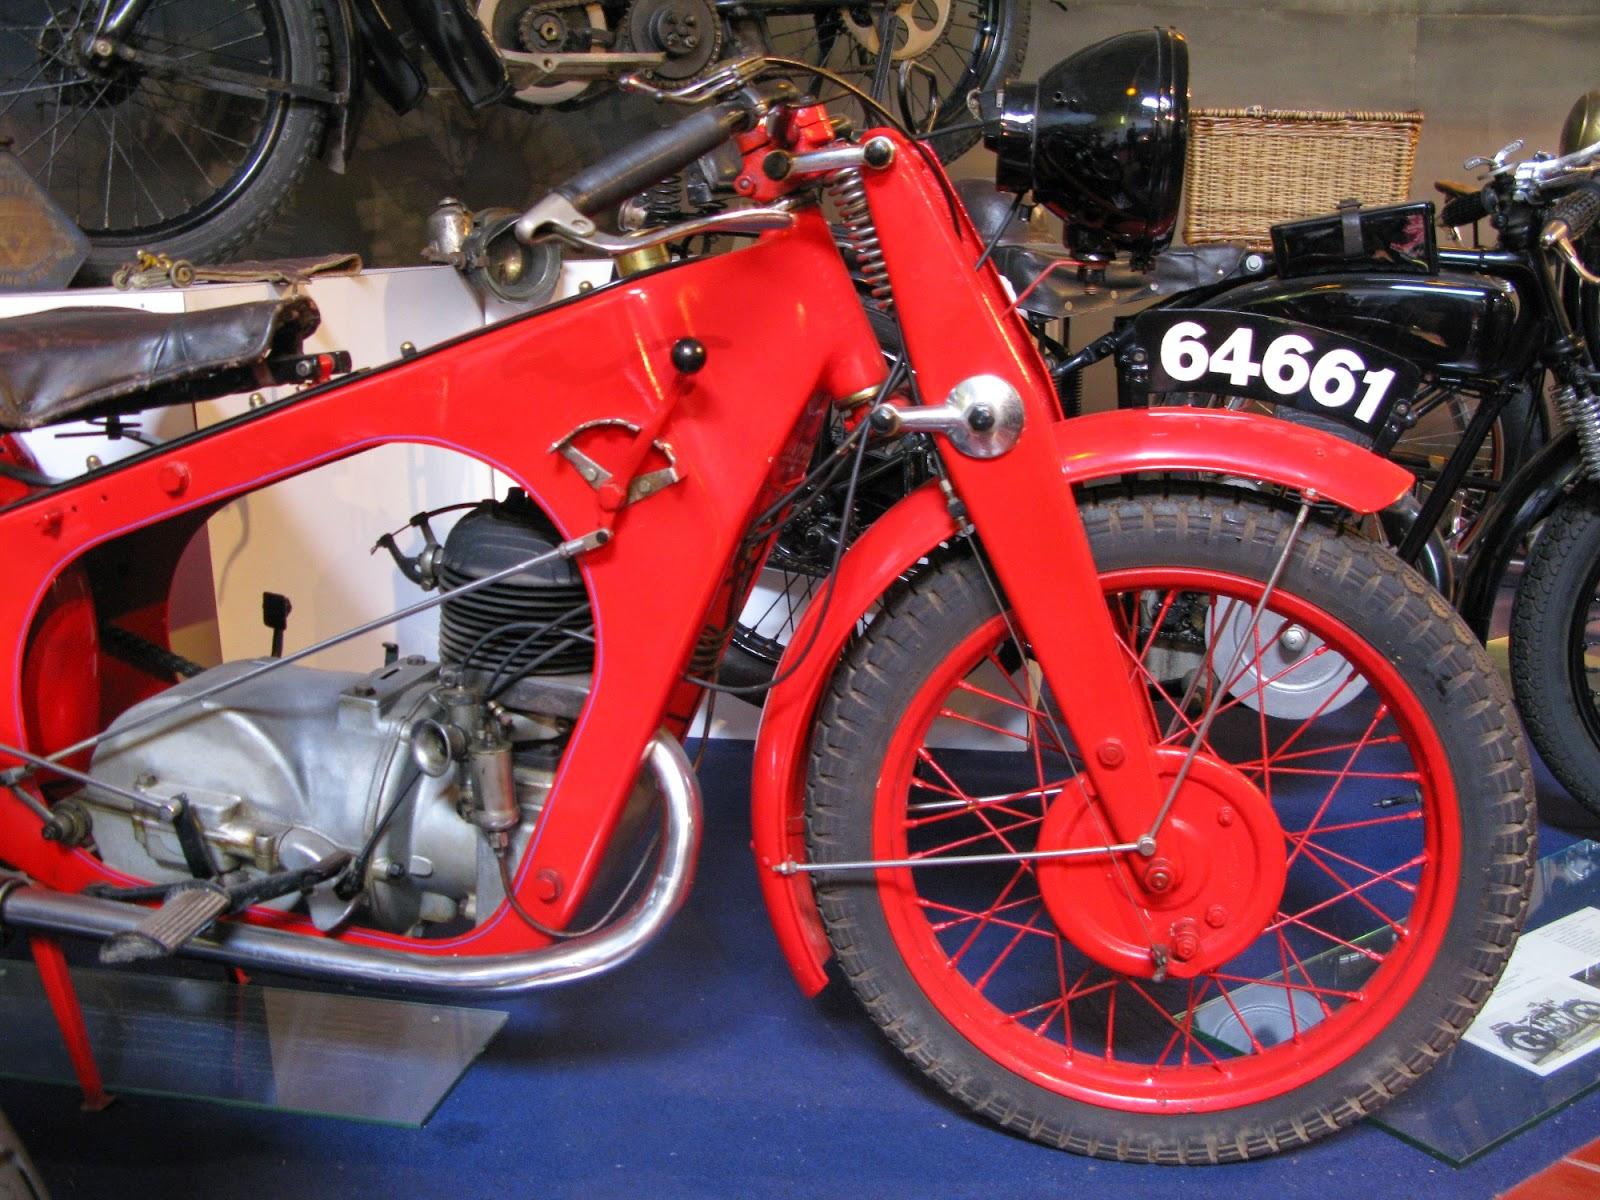 1931 La Mondiale motorcycle